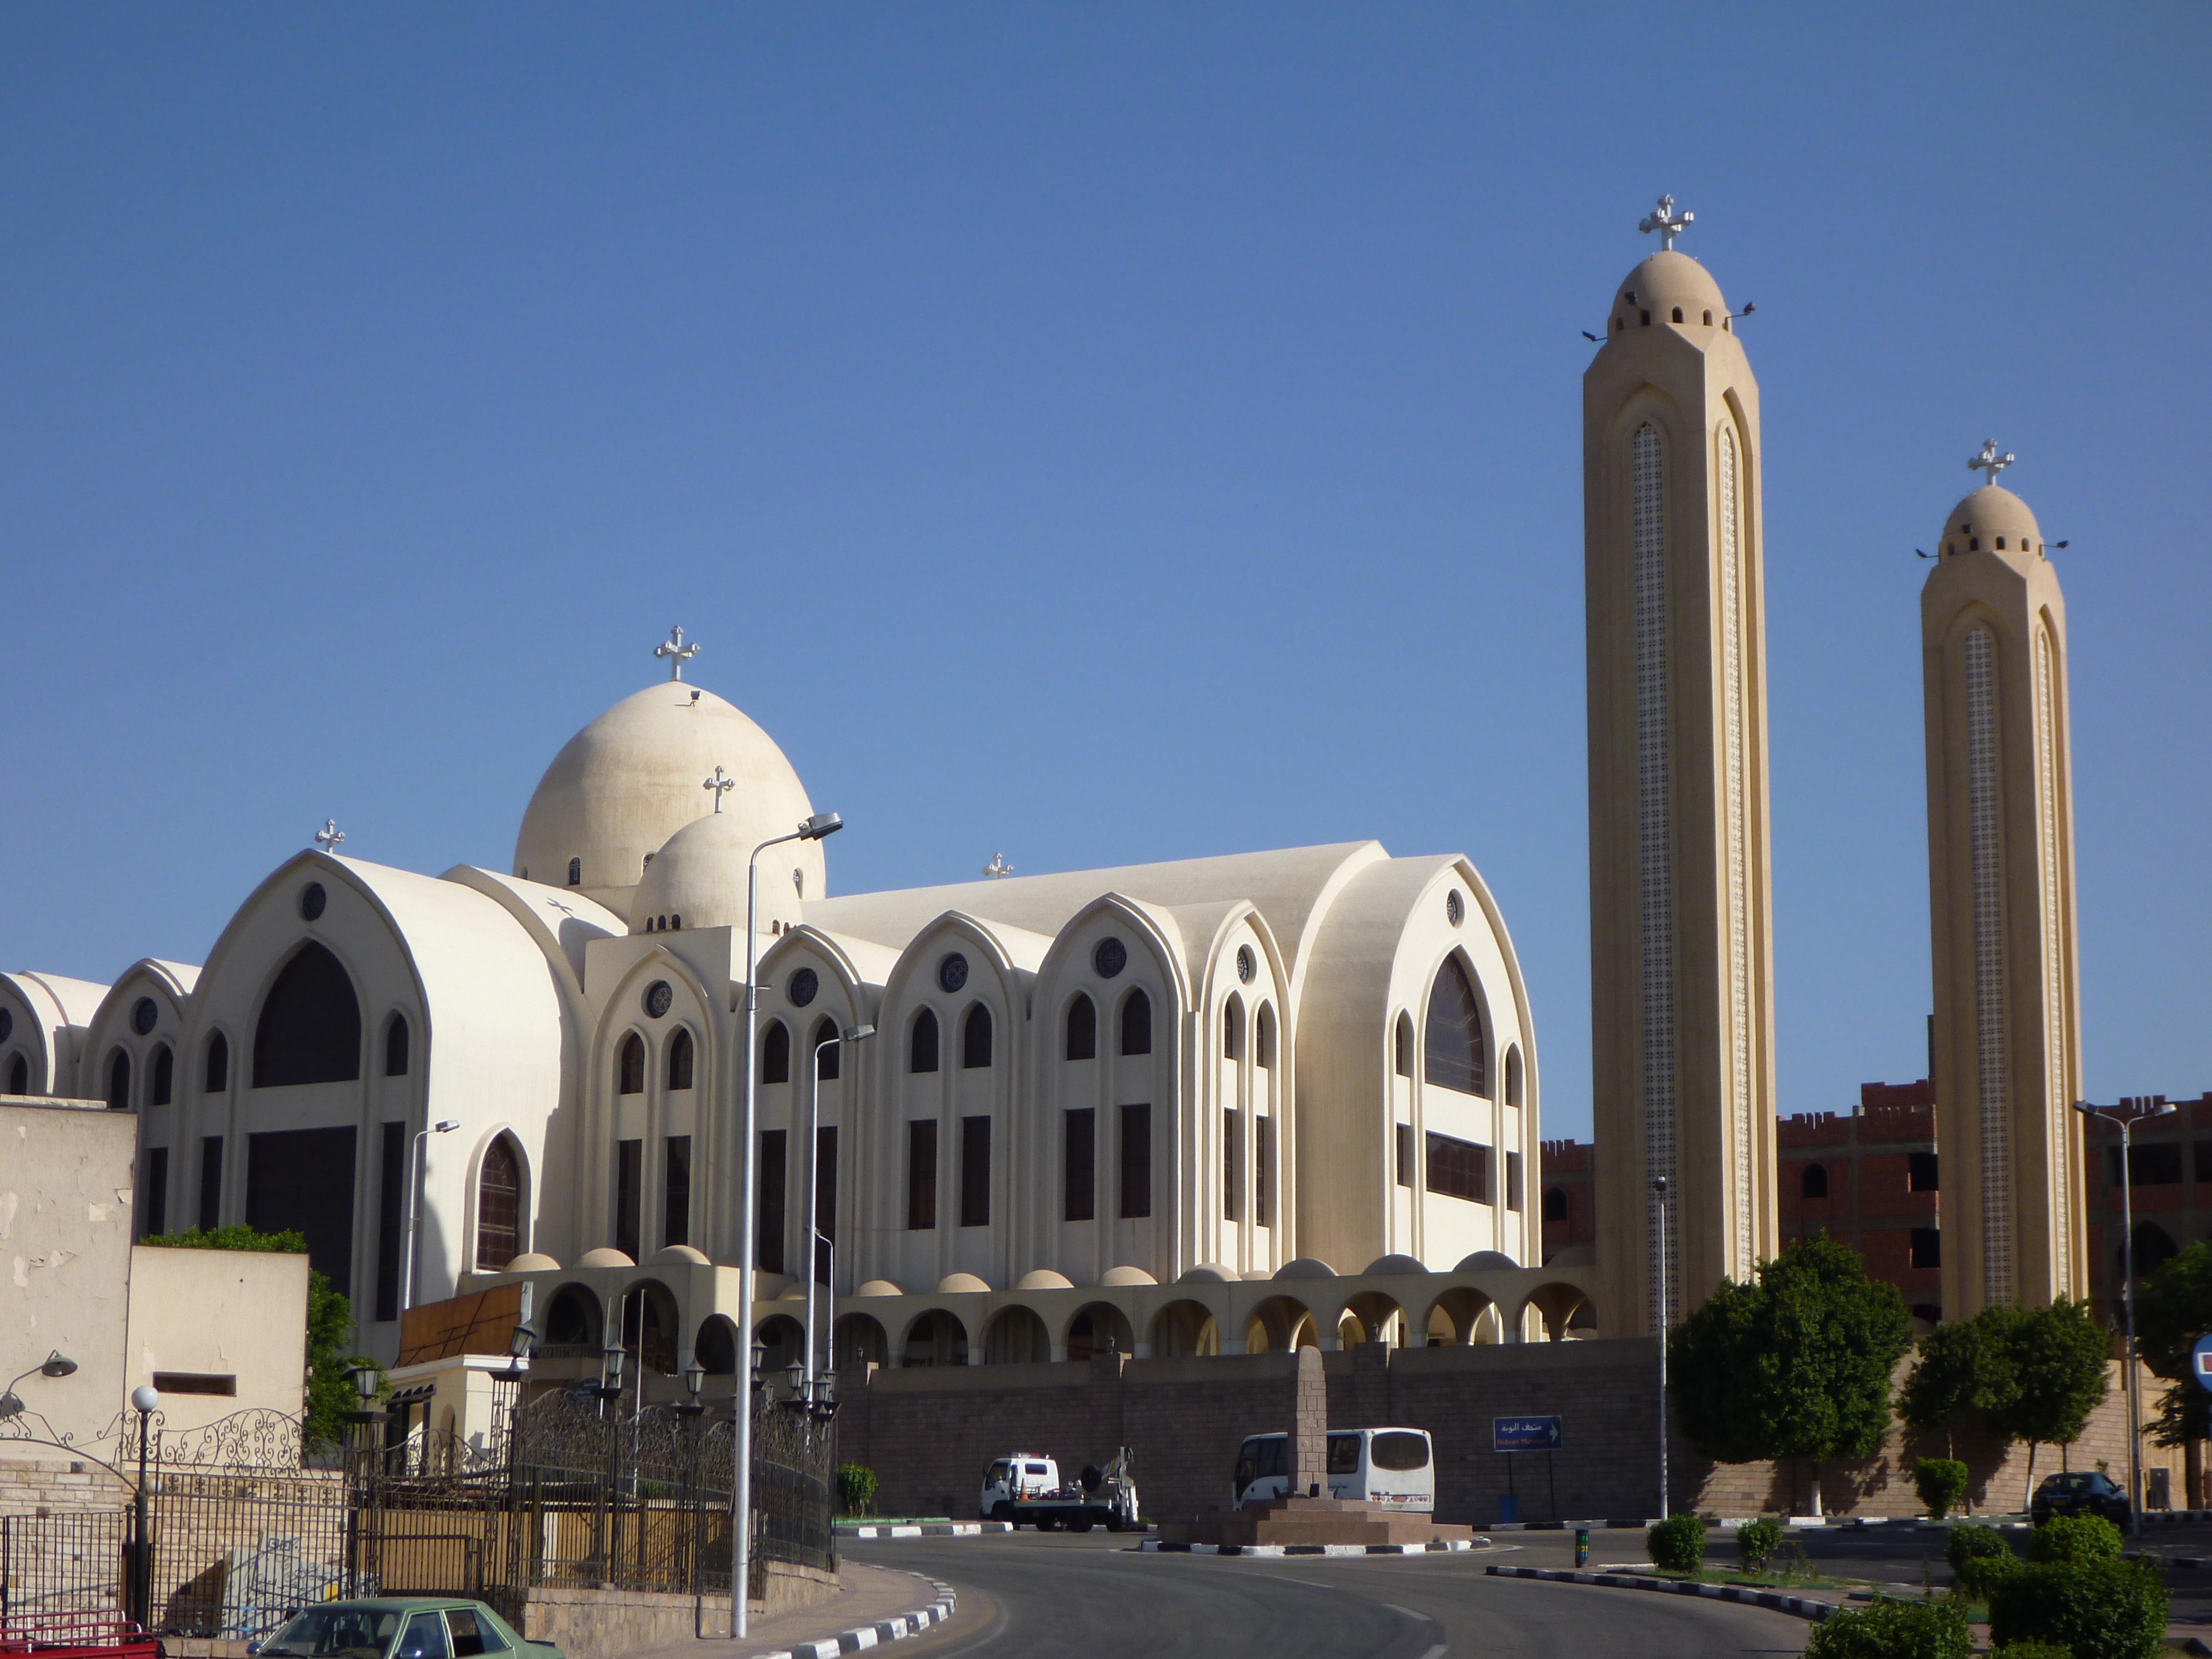 {filename}-Top 10 Most Beautiful Churches In Africa